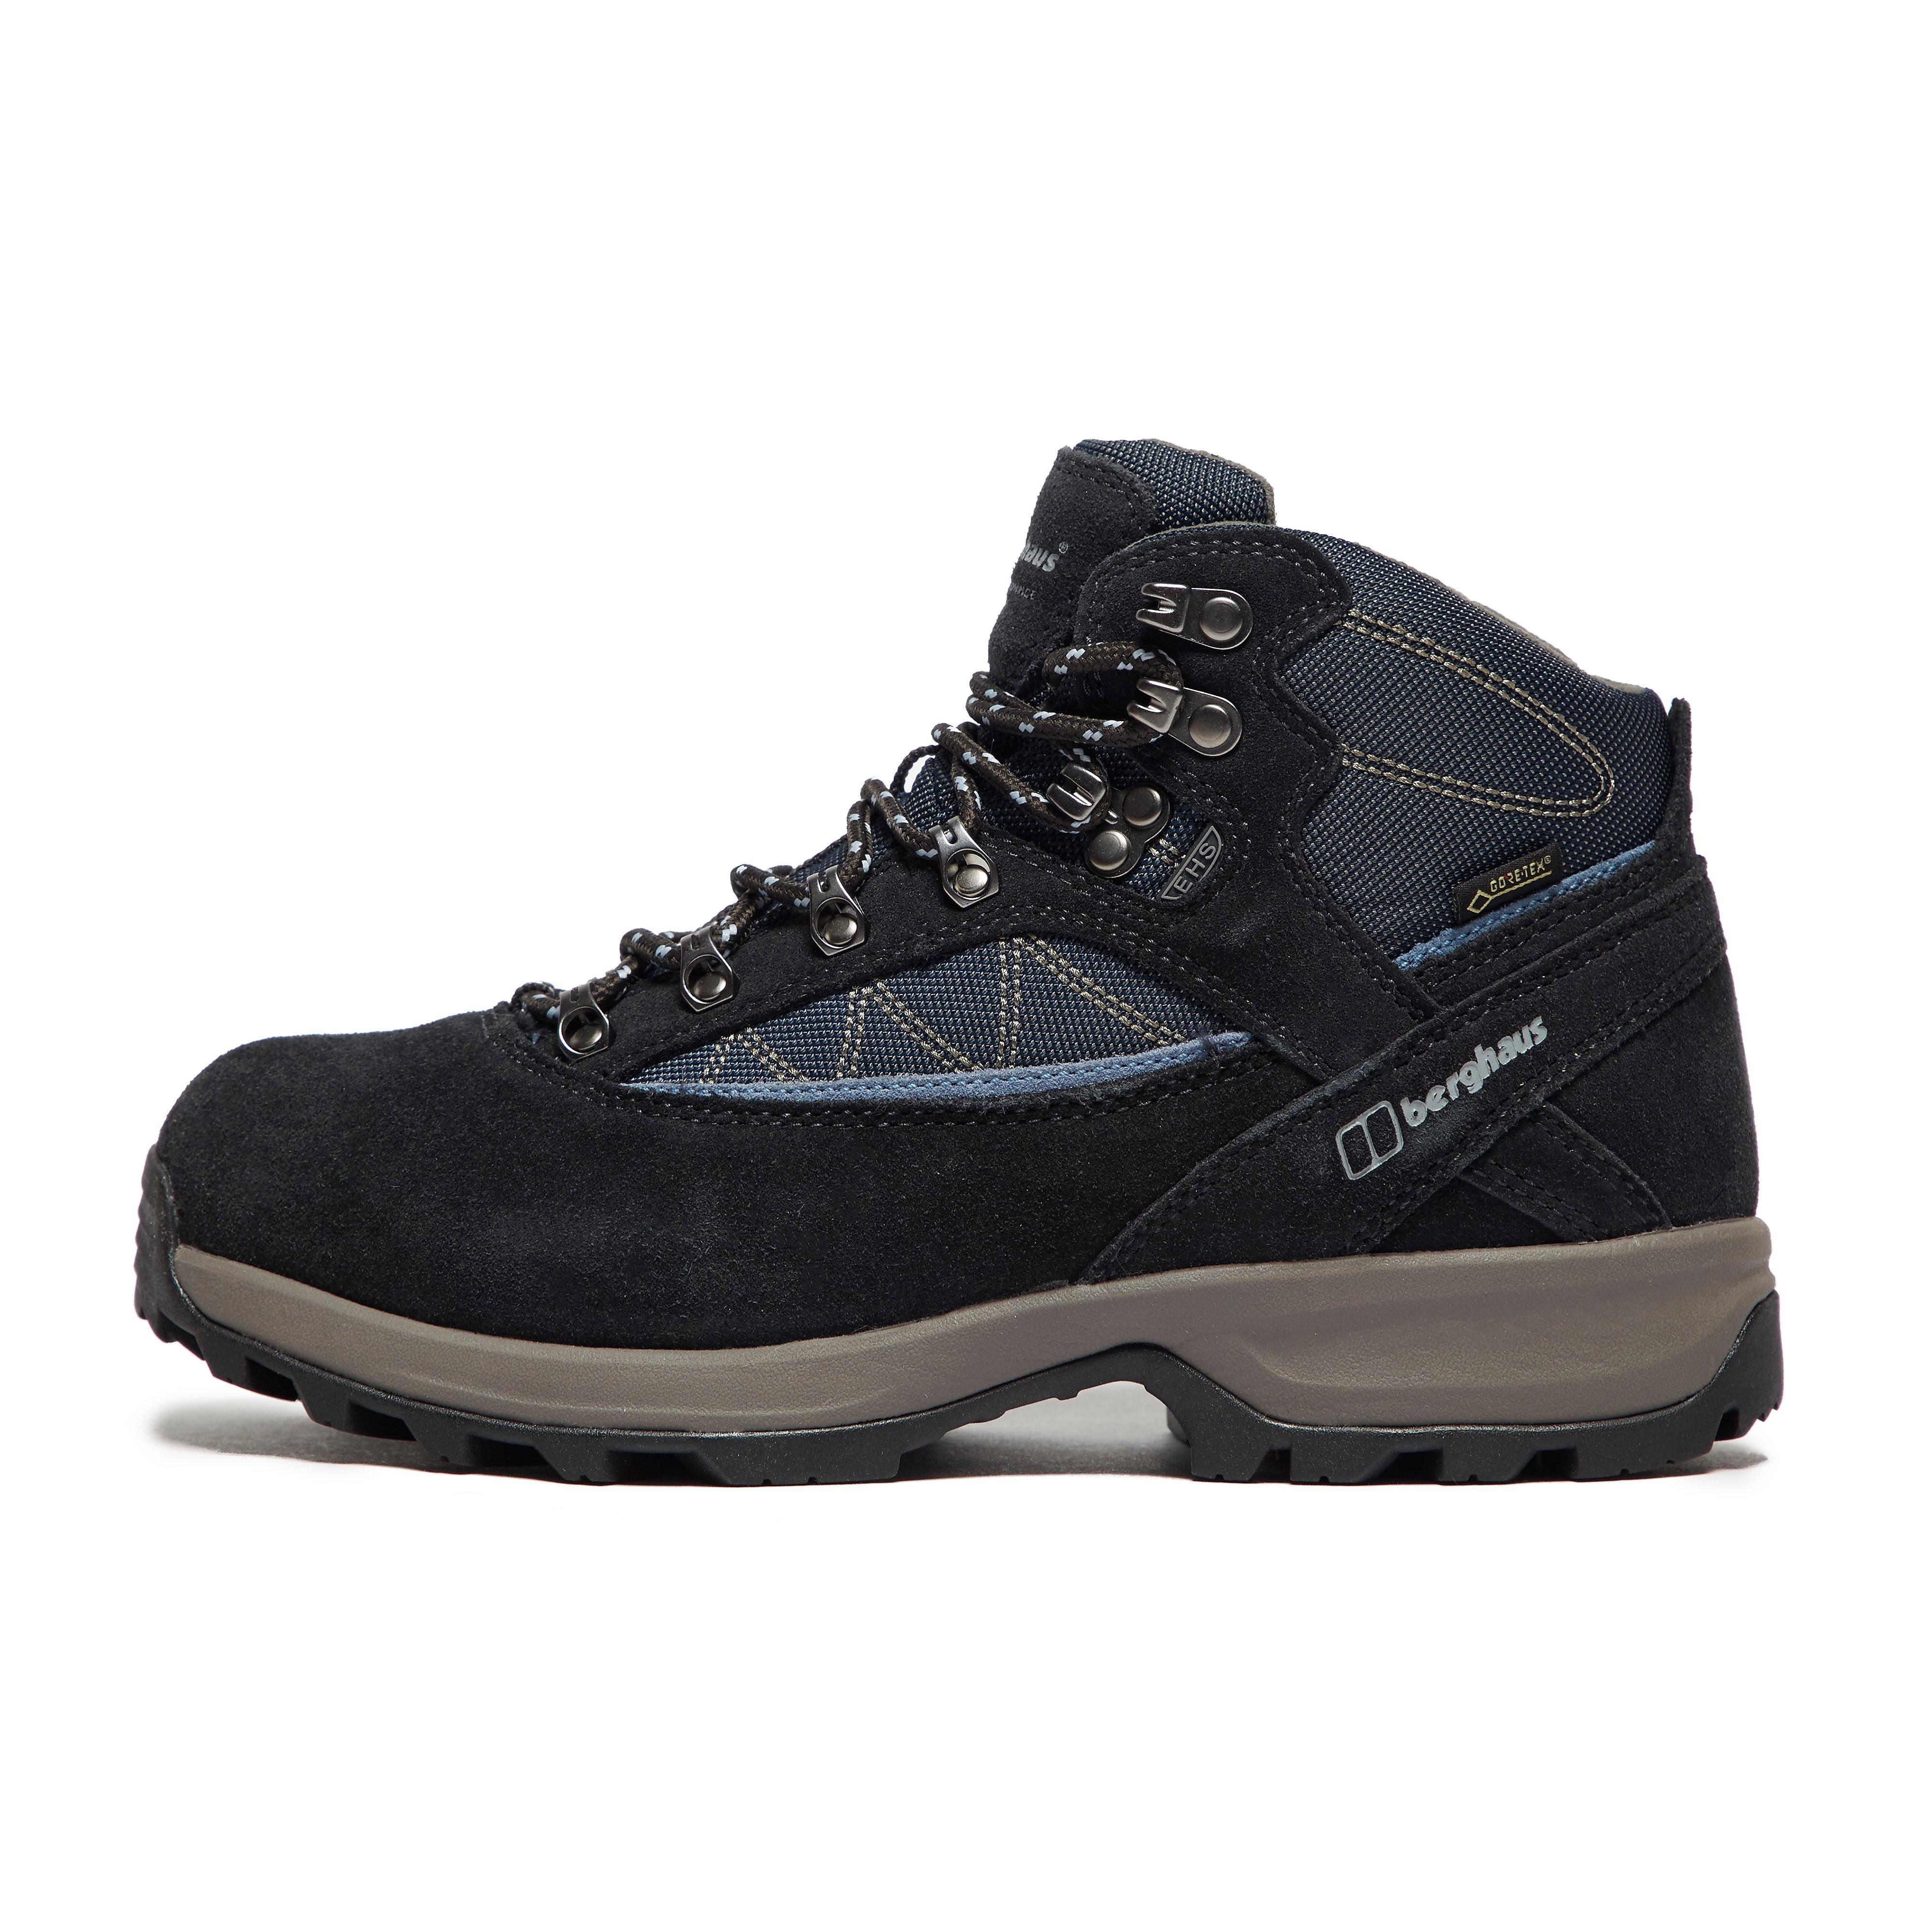 Berghaus Explorer Trek VII Gore-Tex Women's Boots